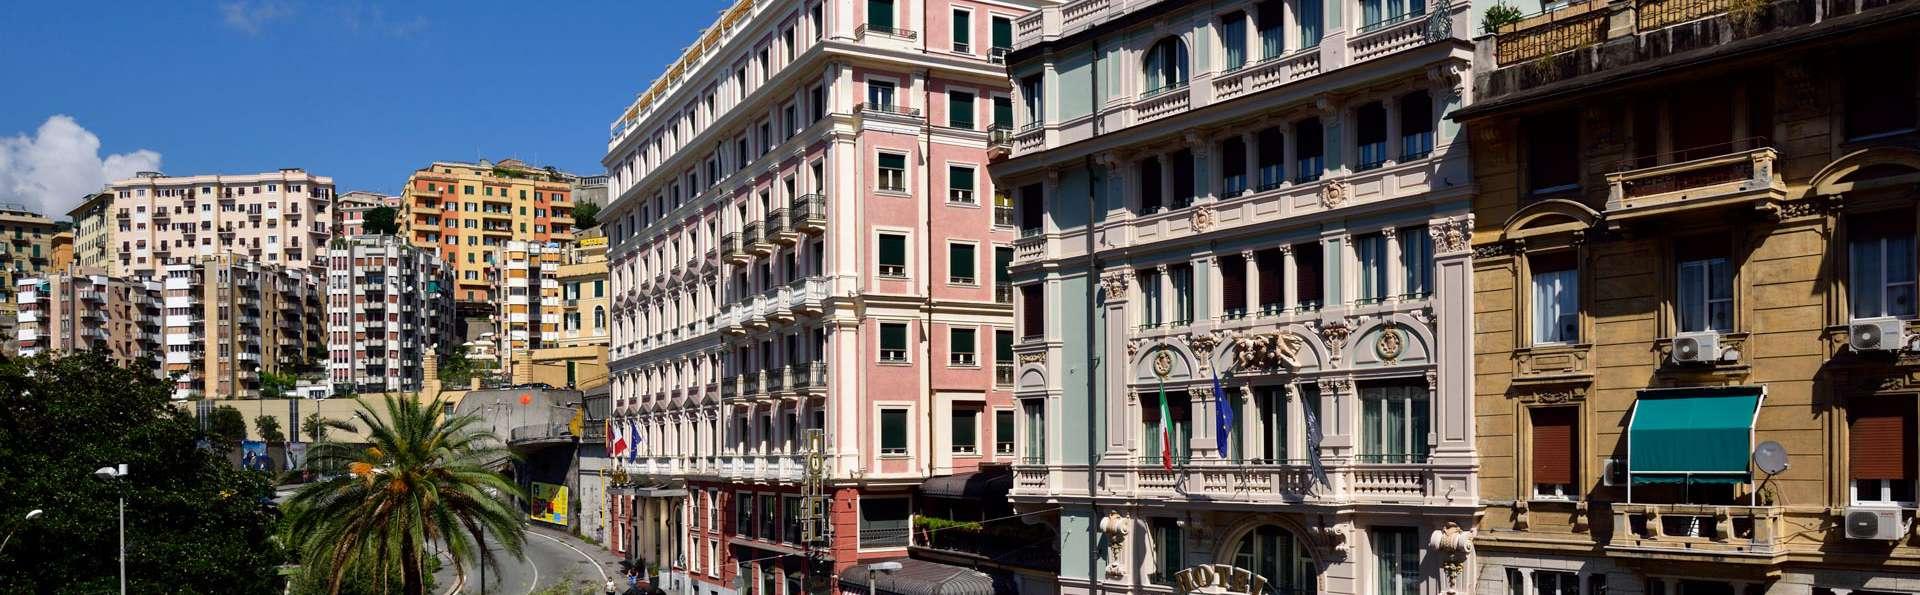 Hotel Continental Genova - EDIT_FRONT_01.jpg